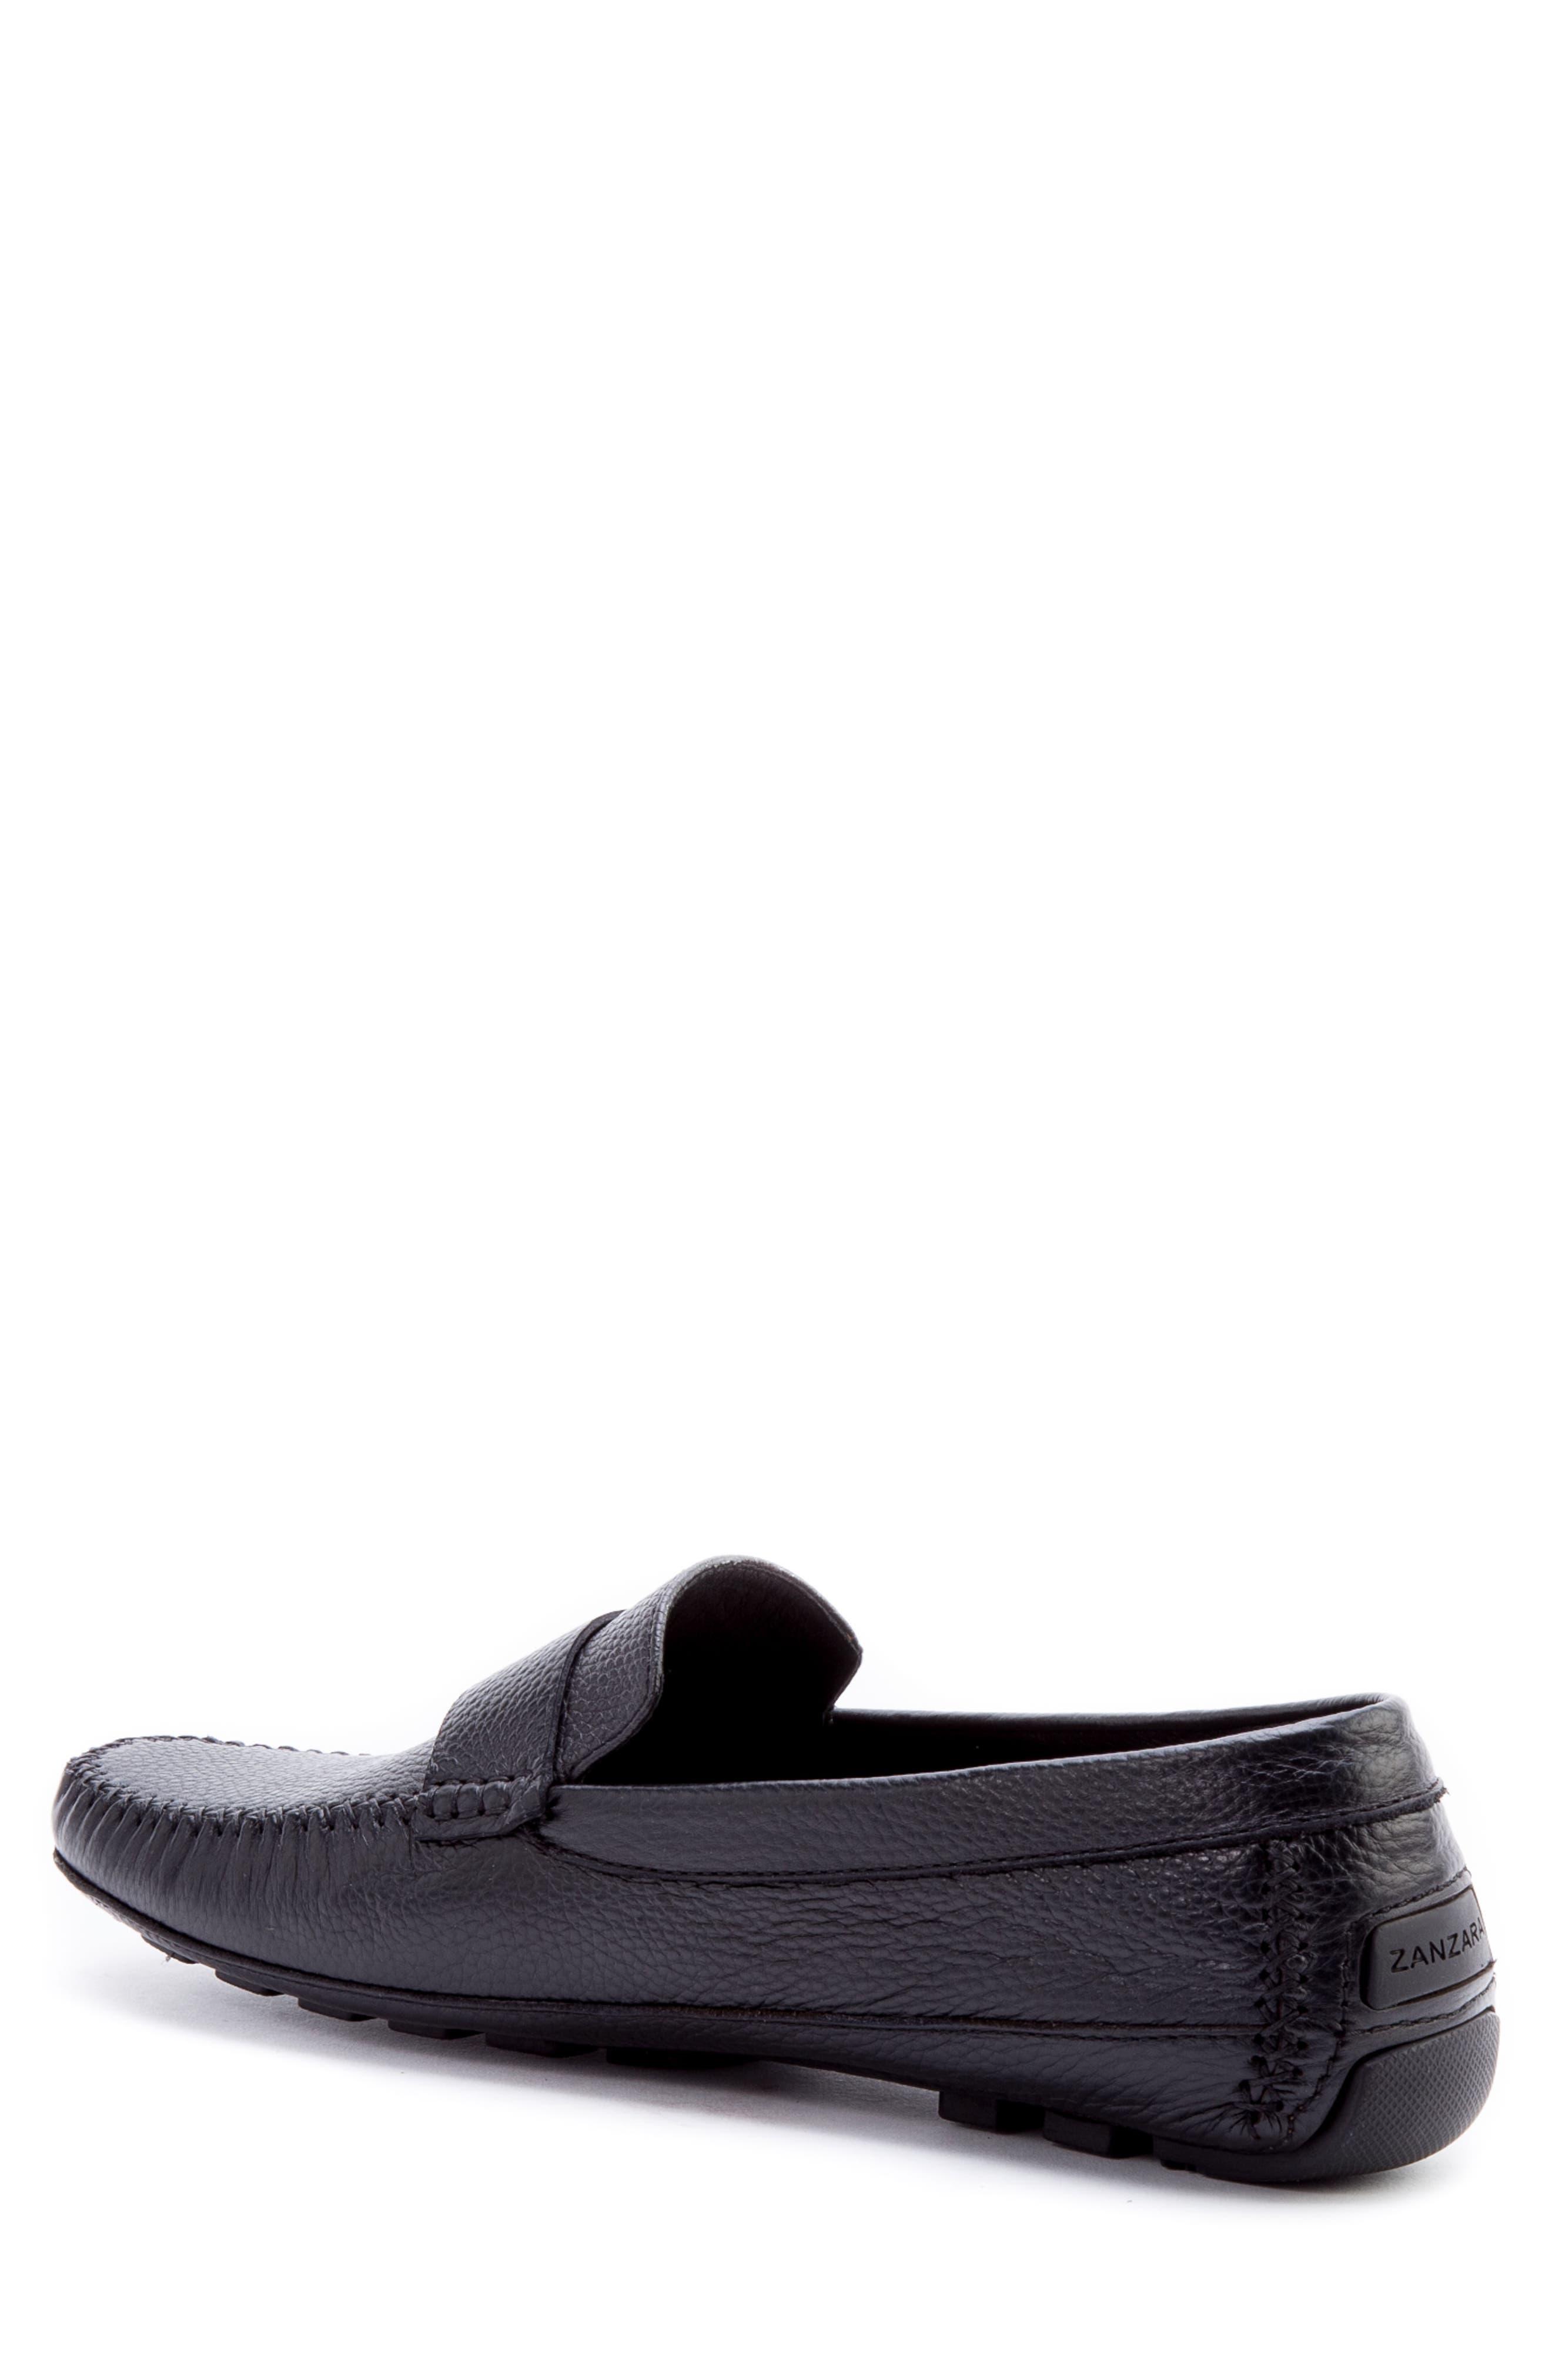 Kandinsky Moc Toe Driving Loafer,                             Alternate thumbnail 2, color,                             Black Leather